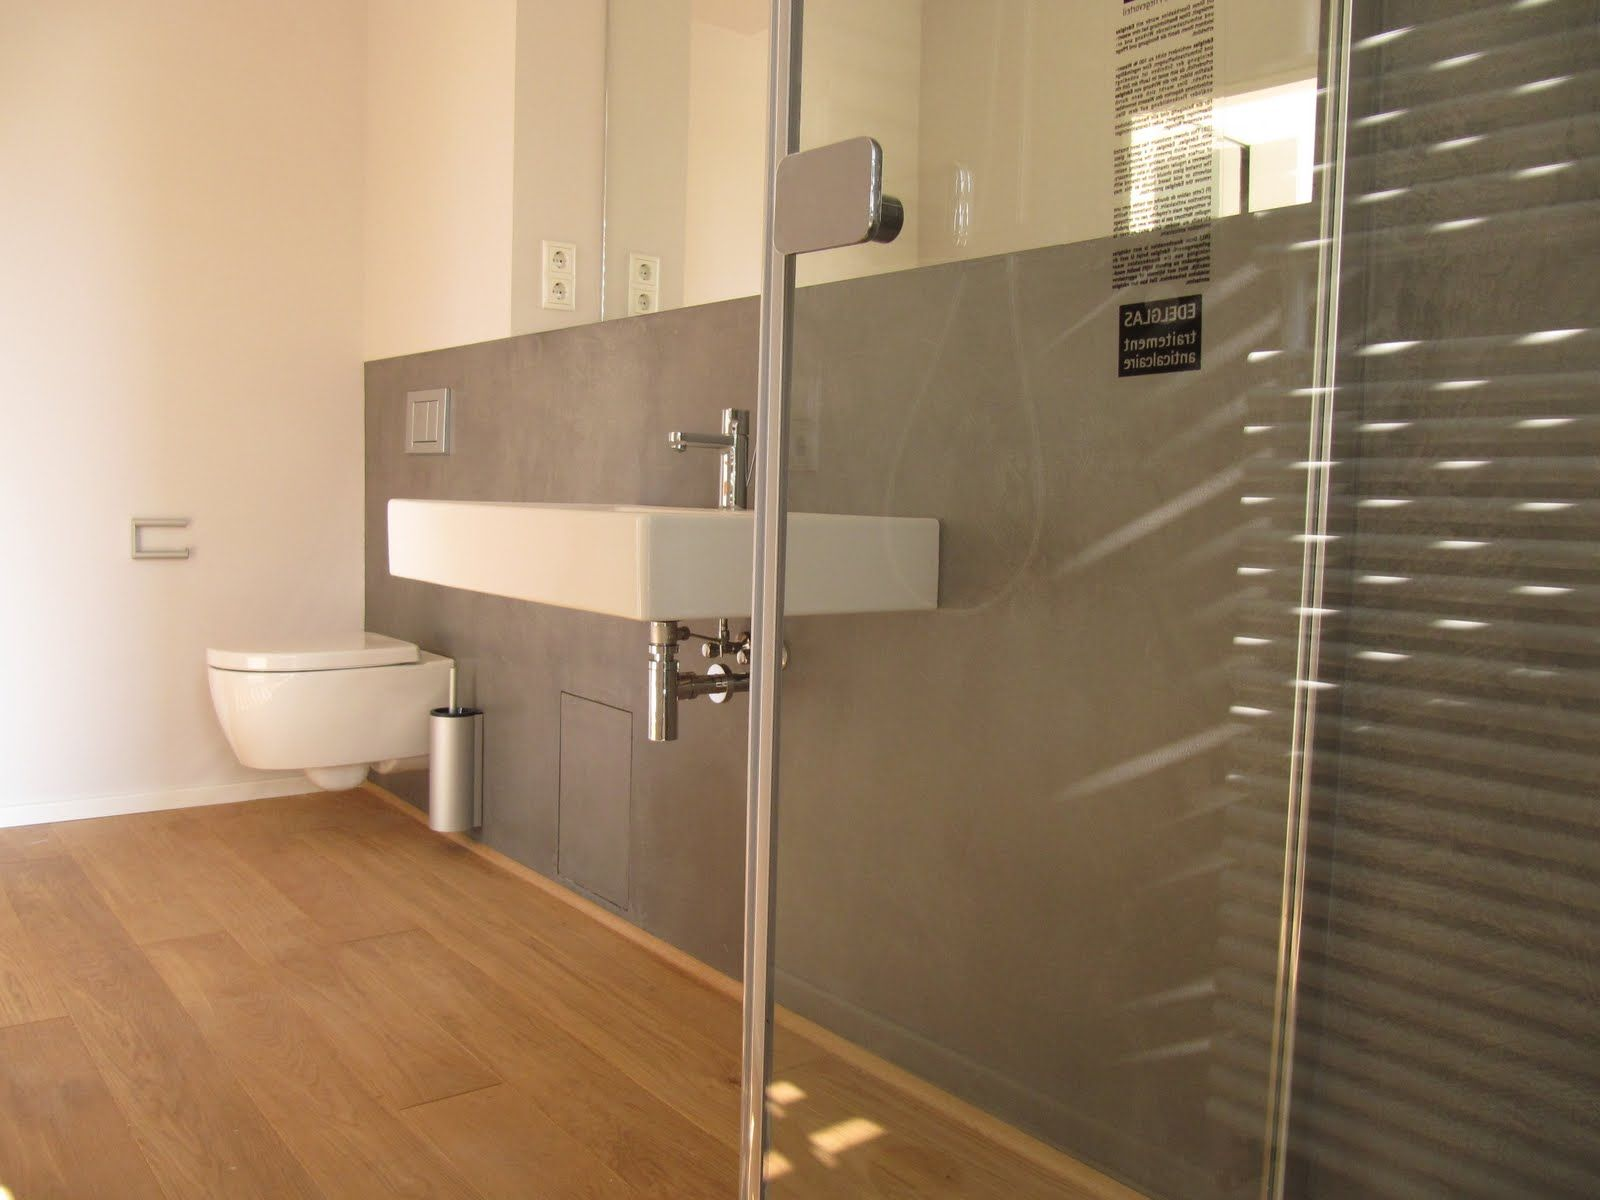 design+handwerk: bad, betoncire, beton cire | beton-cire, Badezimmer ideen